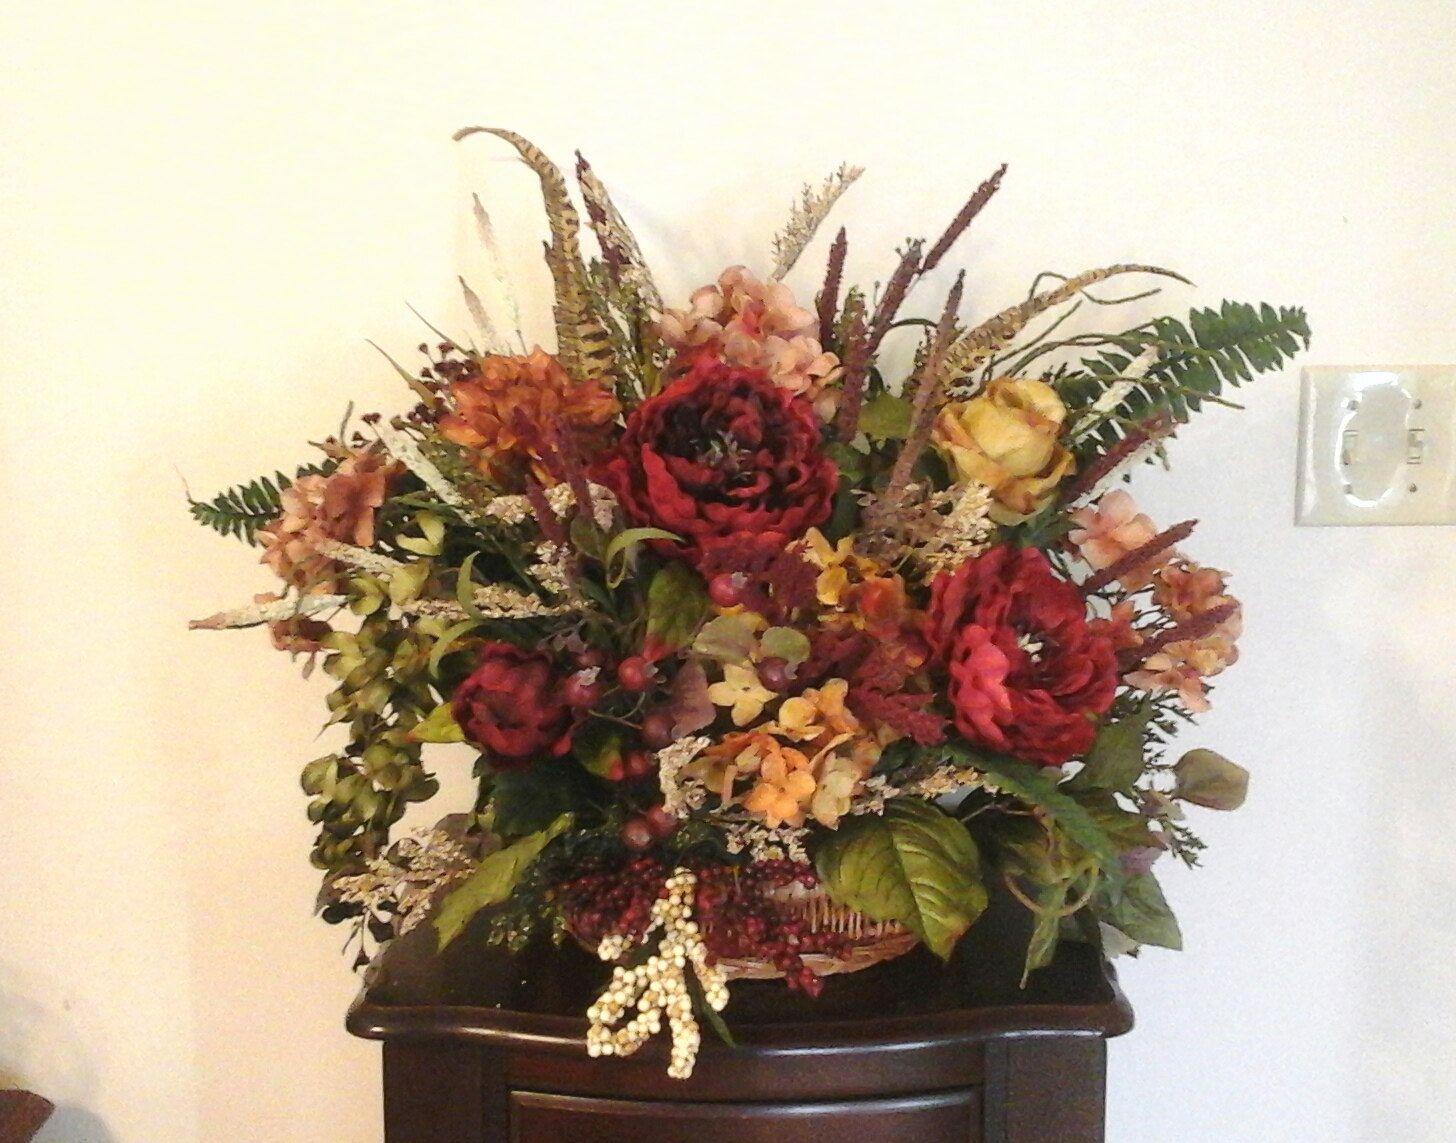 Floral Arrangement Summer Flower Basket Arrangement Table Mantel